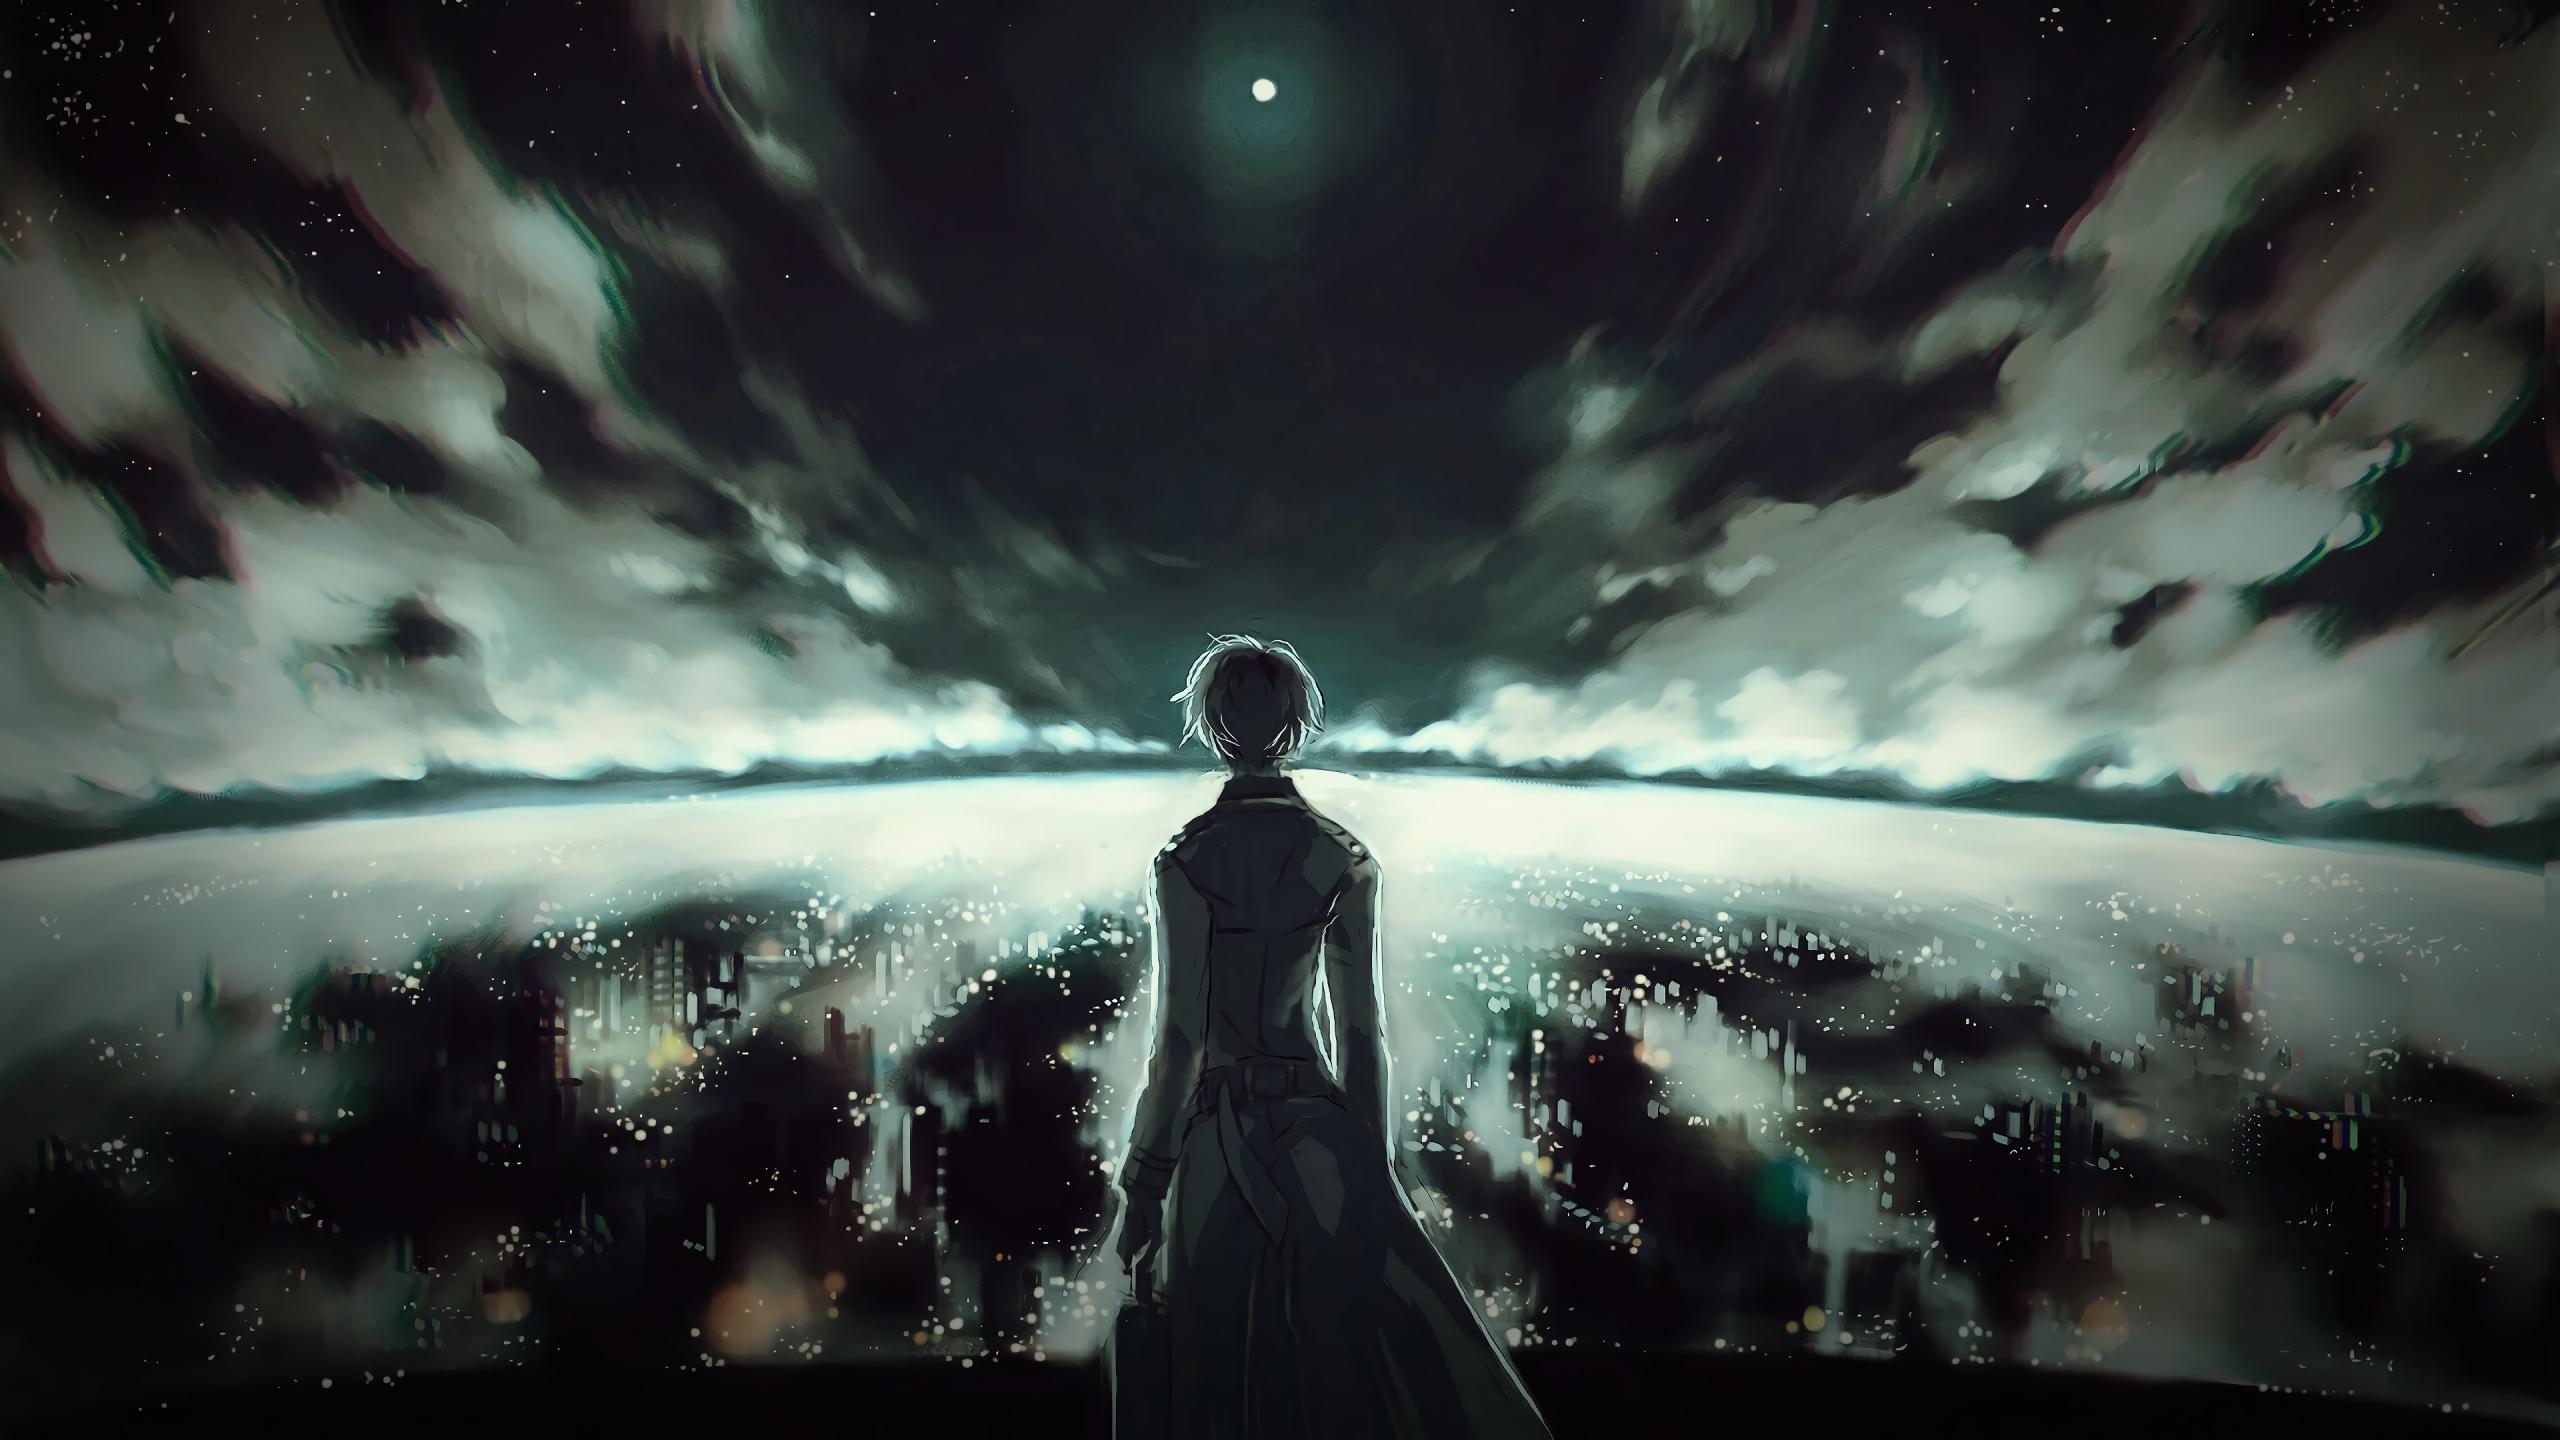 Download 2560x1440 wallpaper ken kaneki tokyo ghoul anime dark dual wide widescreen 16 9 - Ken hd wallpaper ...